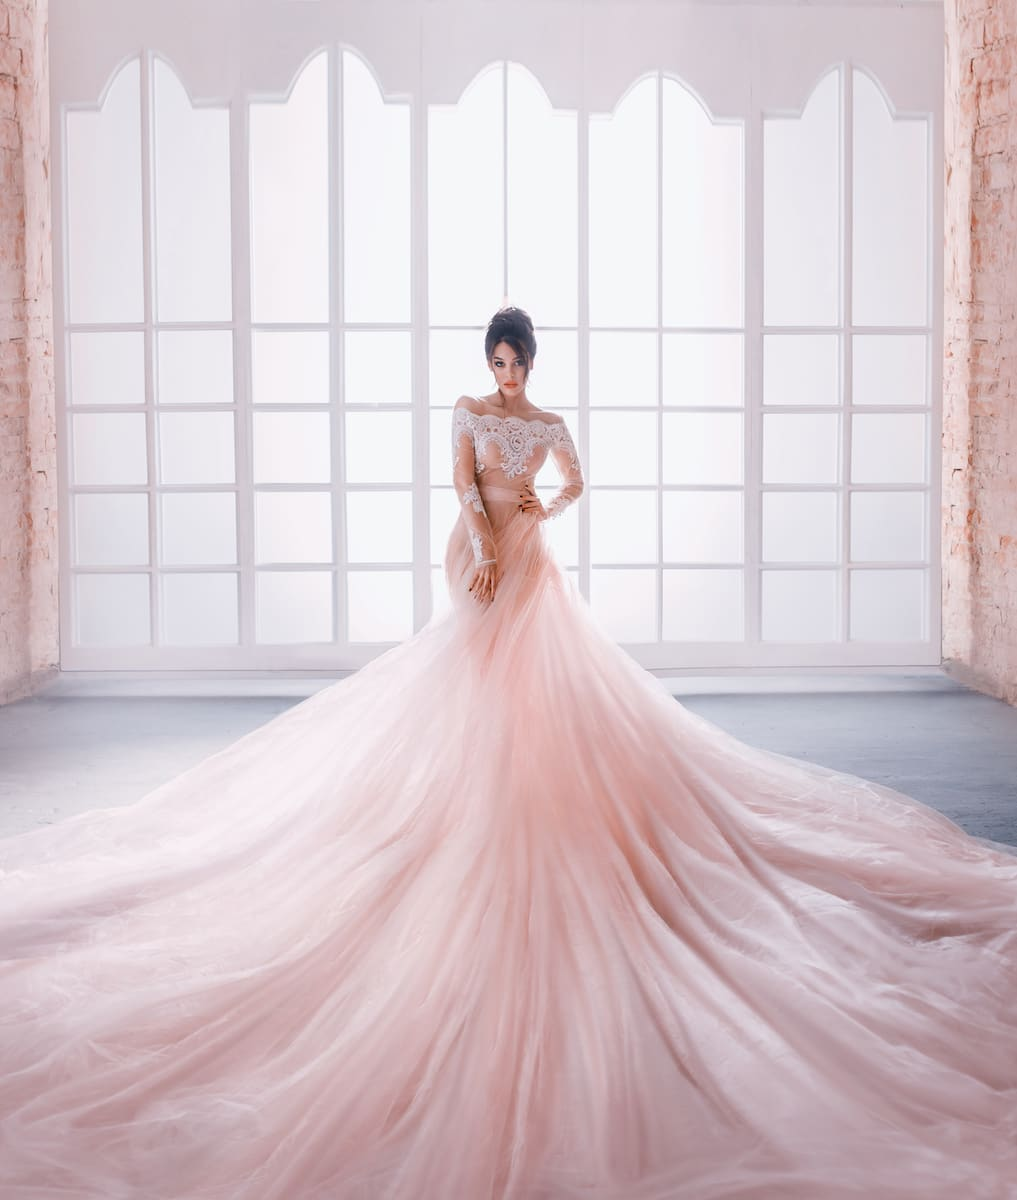 Vestiti Da Sposa Shabby.Boho Shabby Chic Wedding Dresses Marialuisa Benetti Bridal Venice